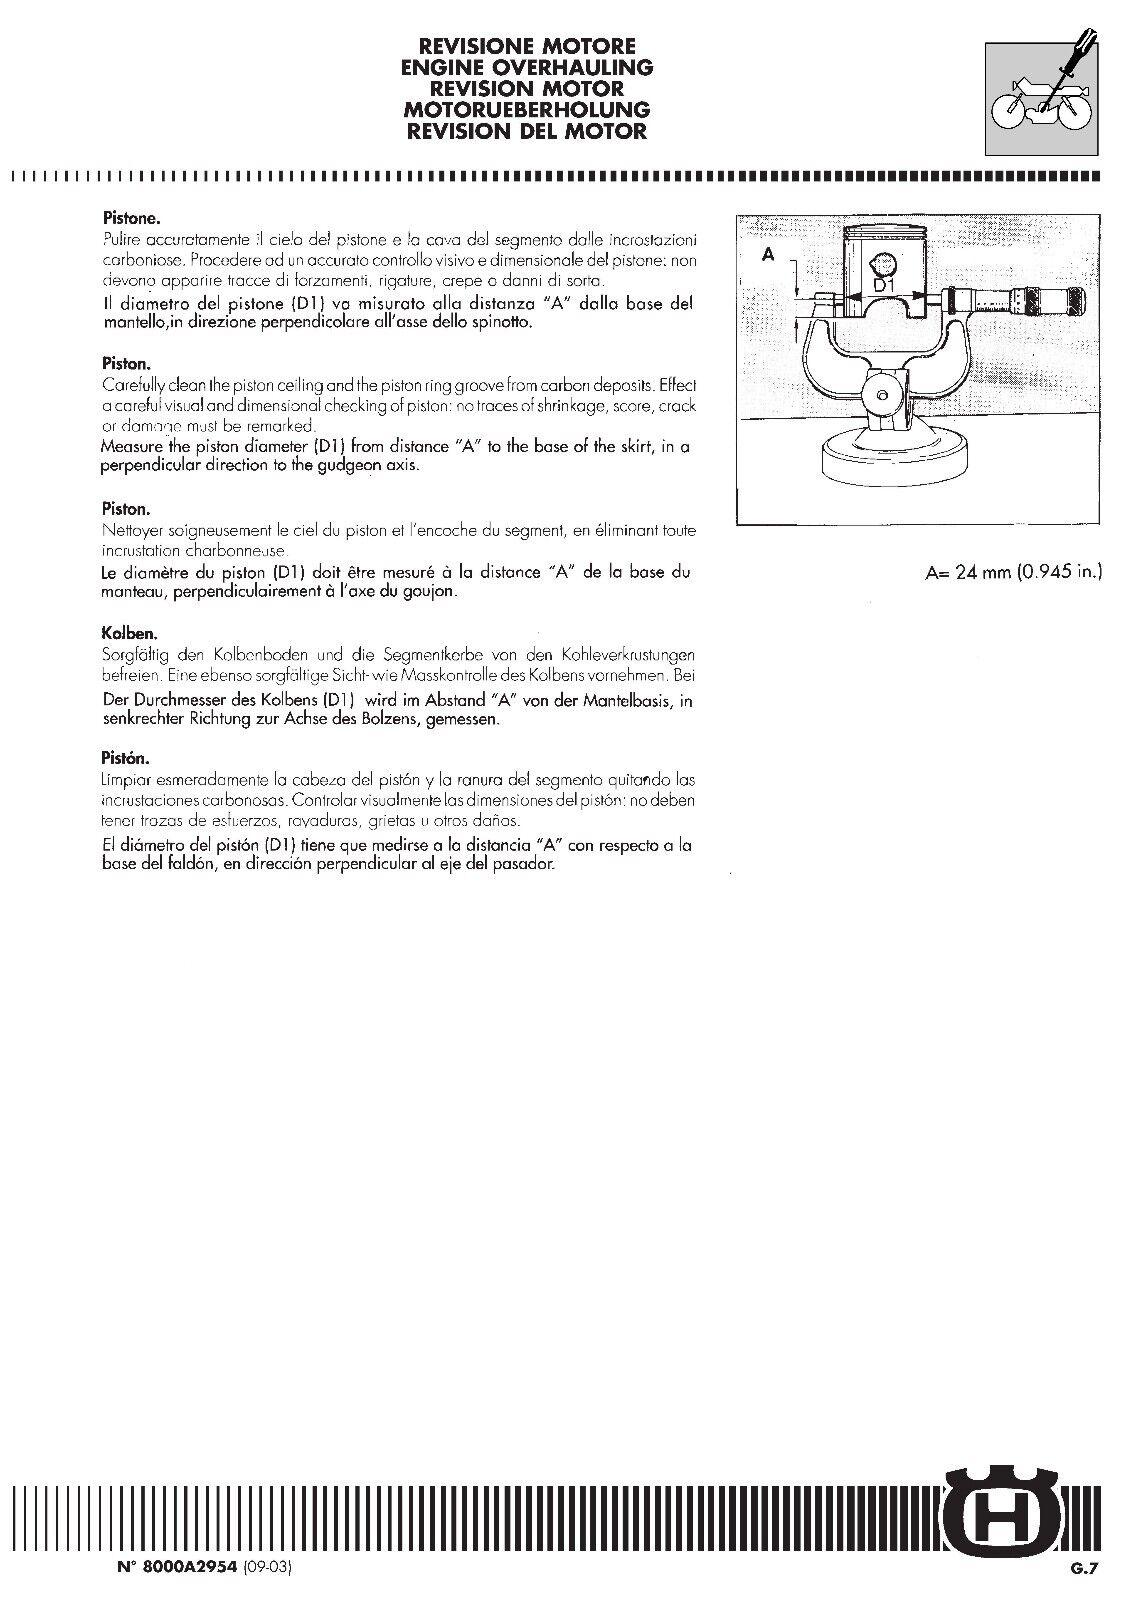 ... Husqvarna workshop service manual 2004 WR 250 & CR 250 4 of 12 ...